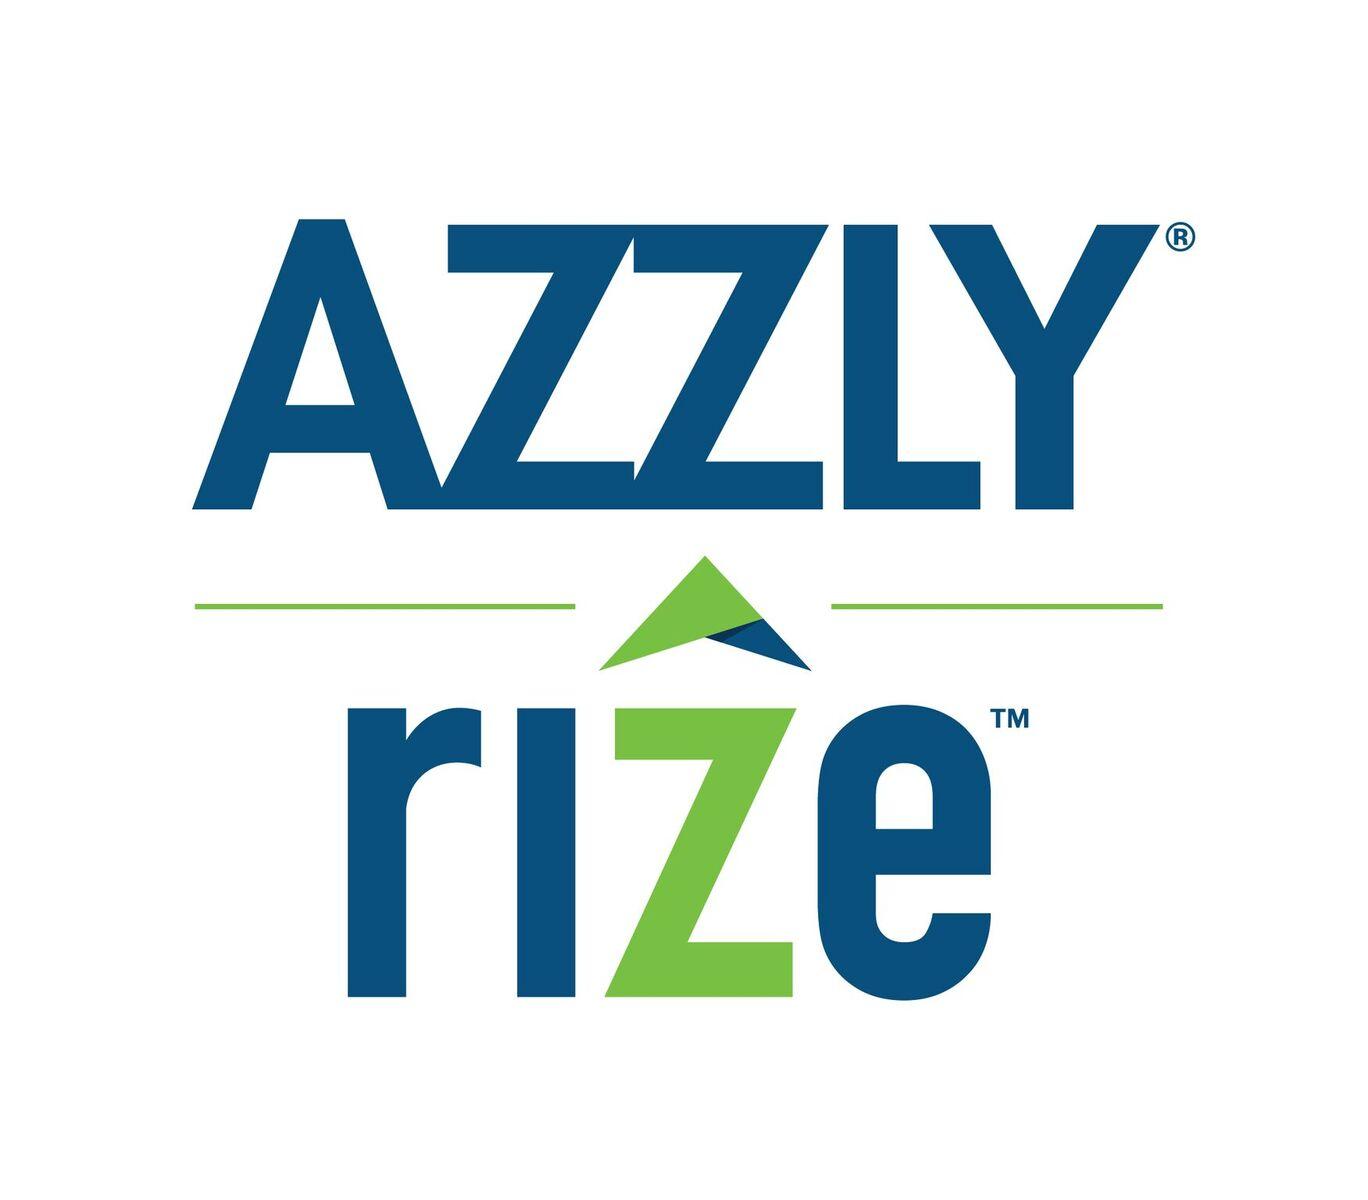 AZZLY Rize logo